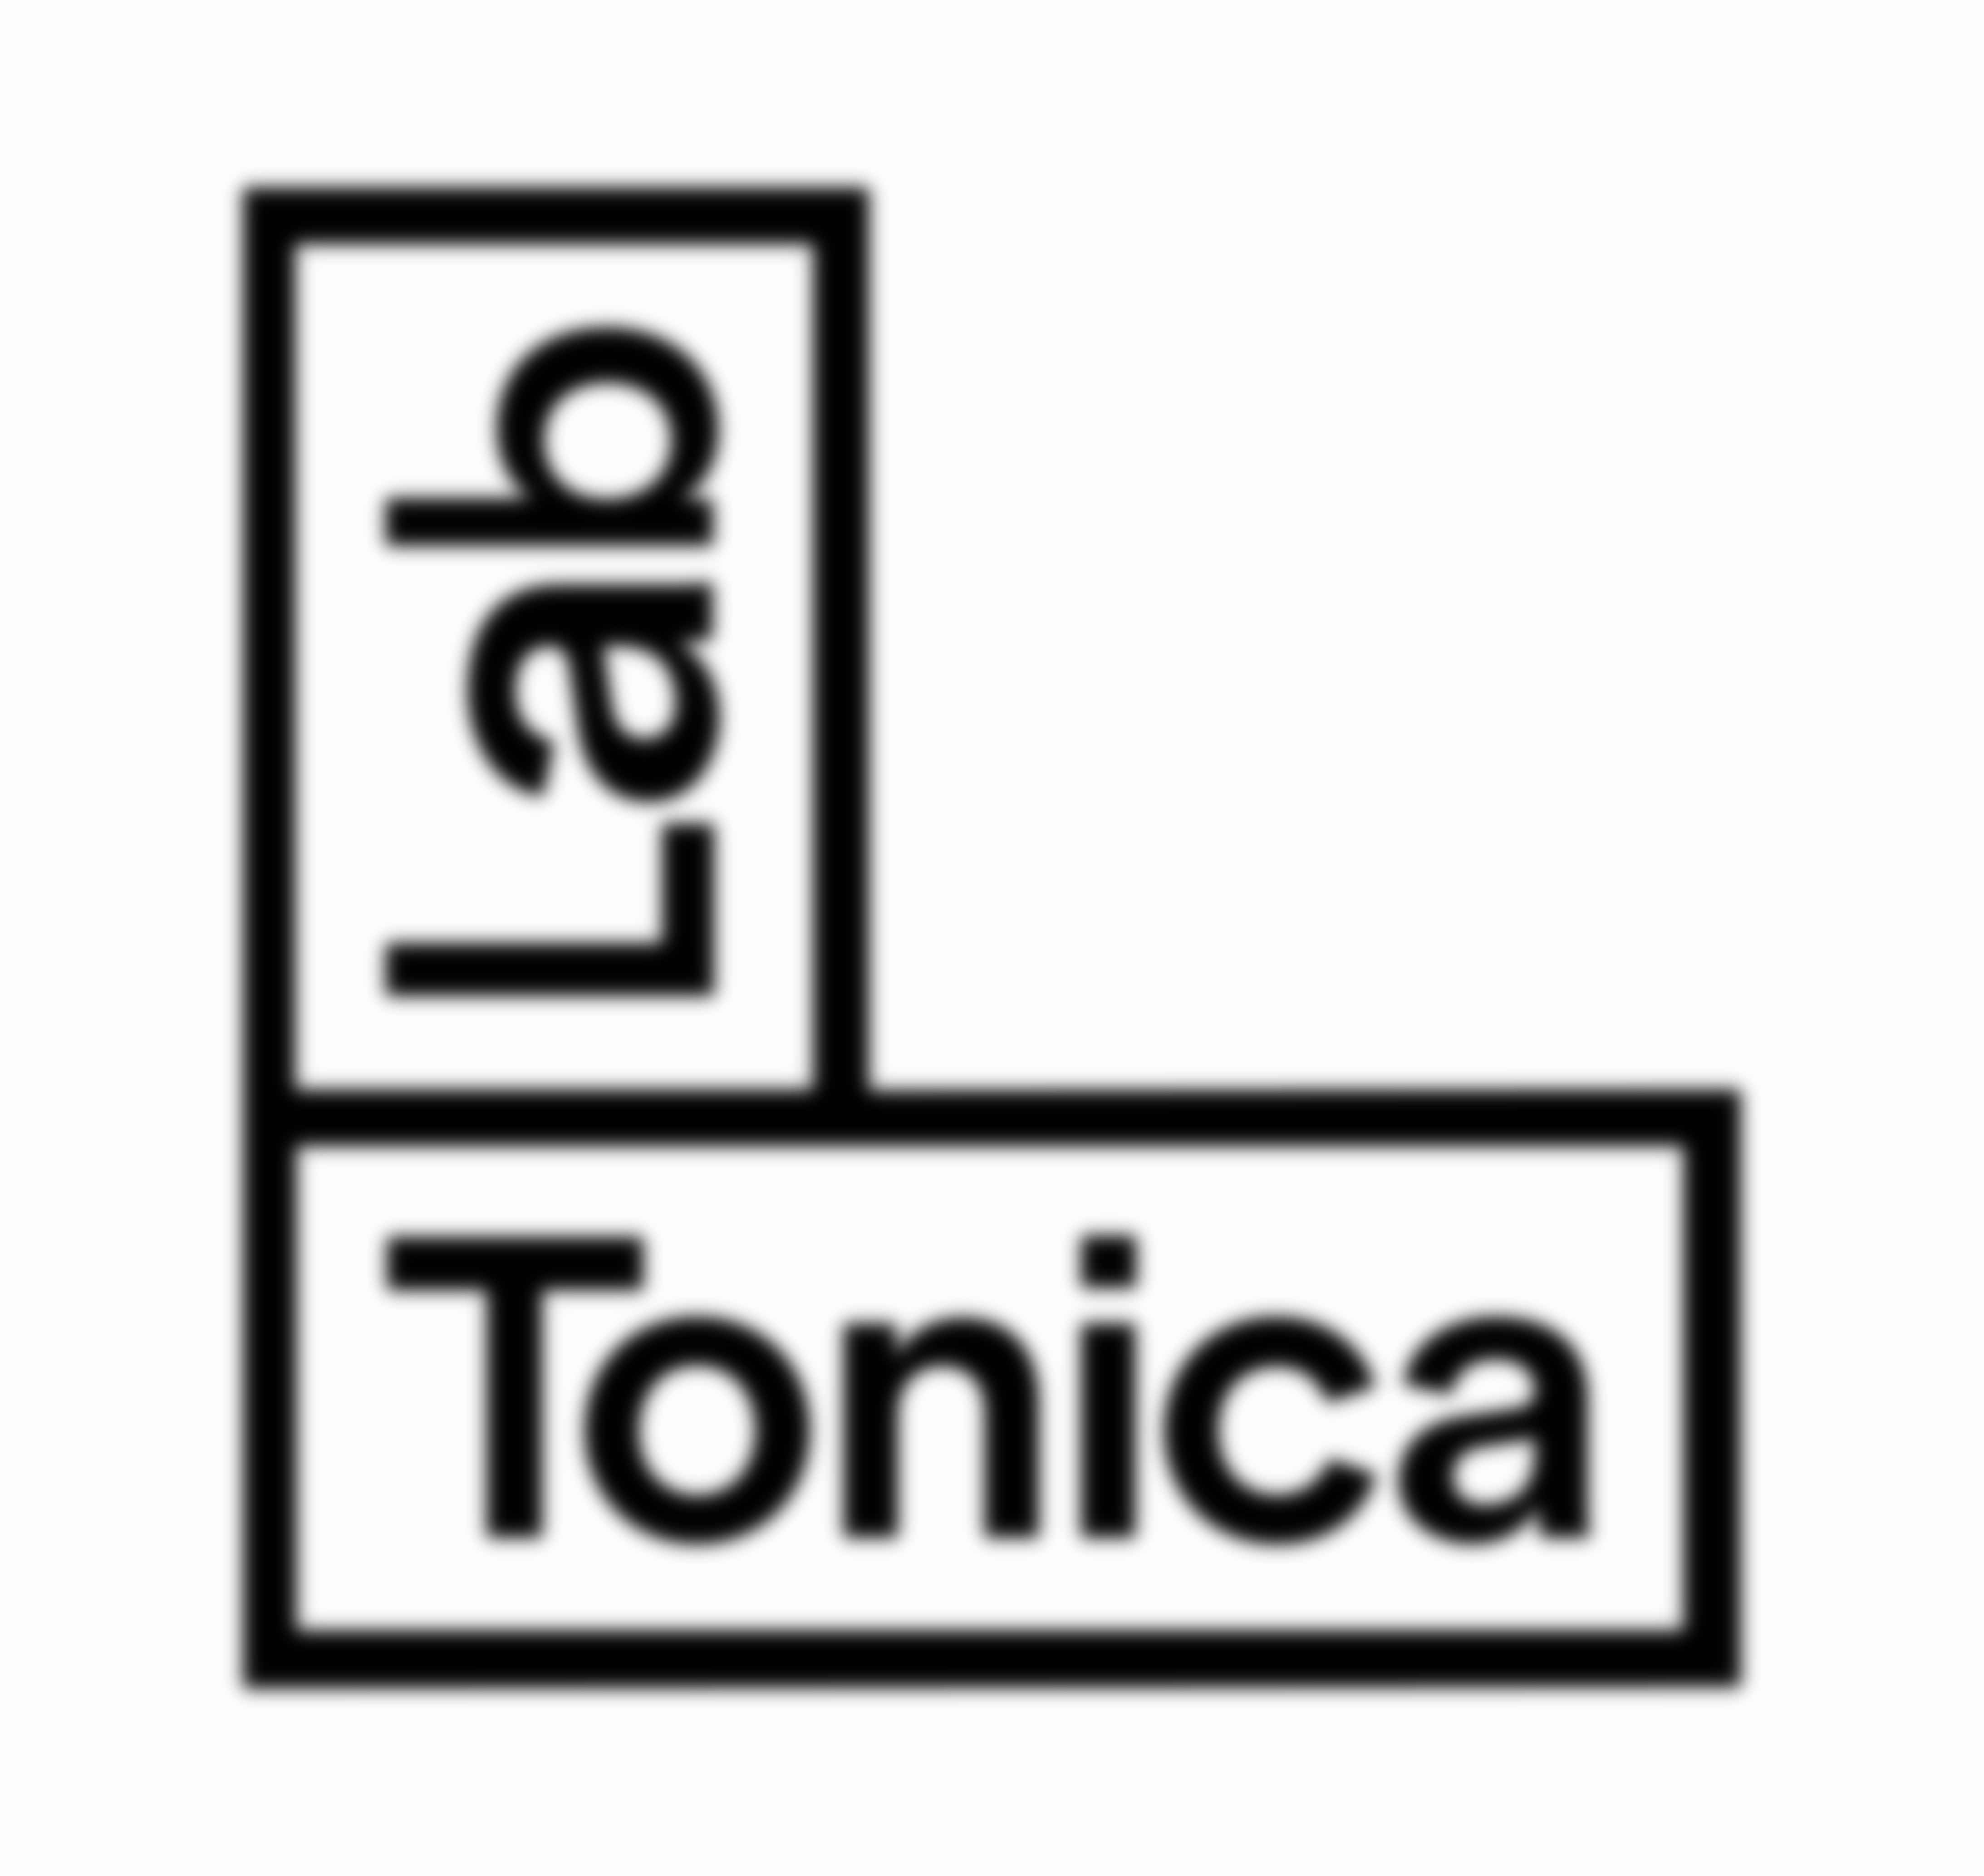 Lab Tonica logo